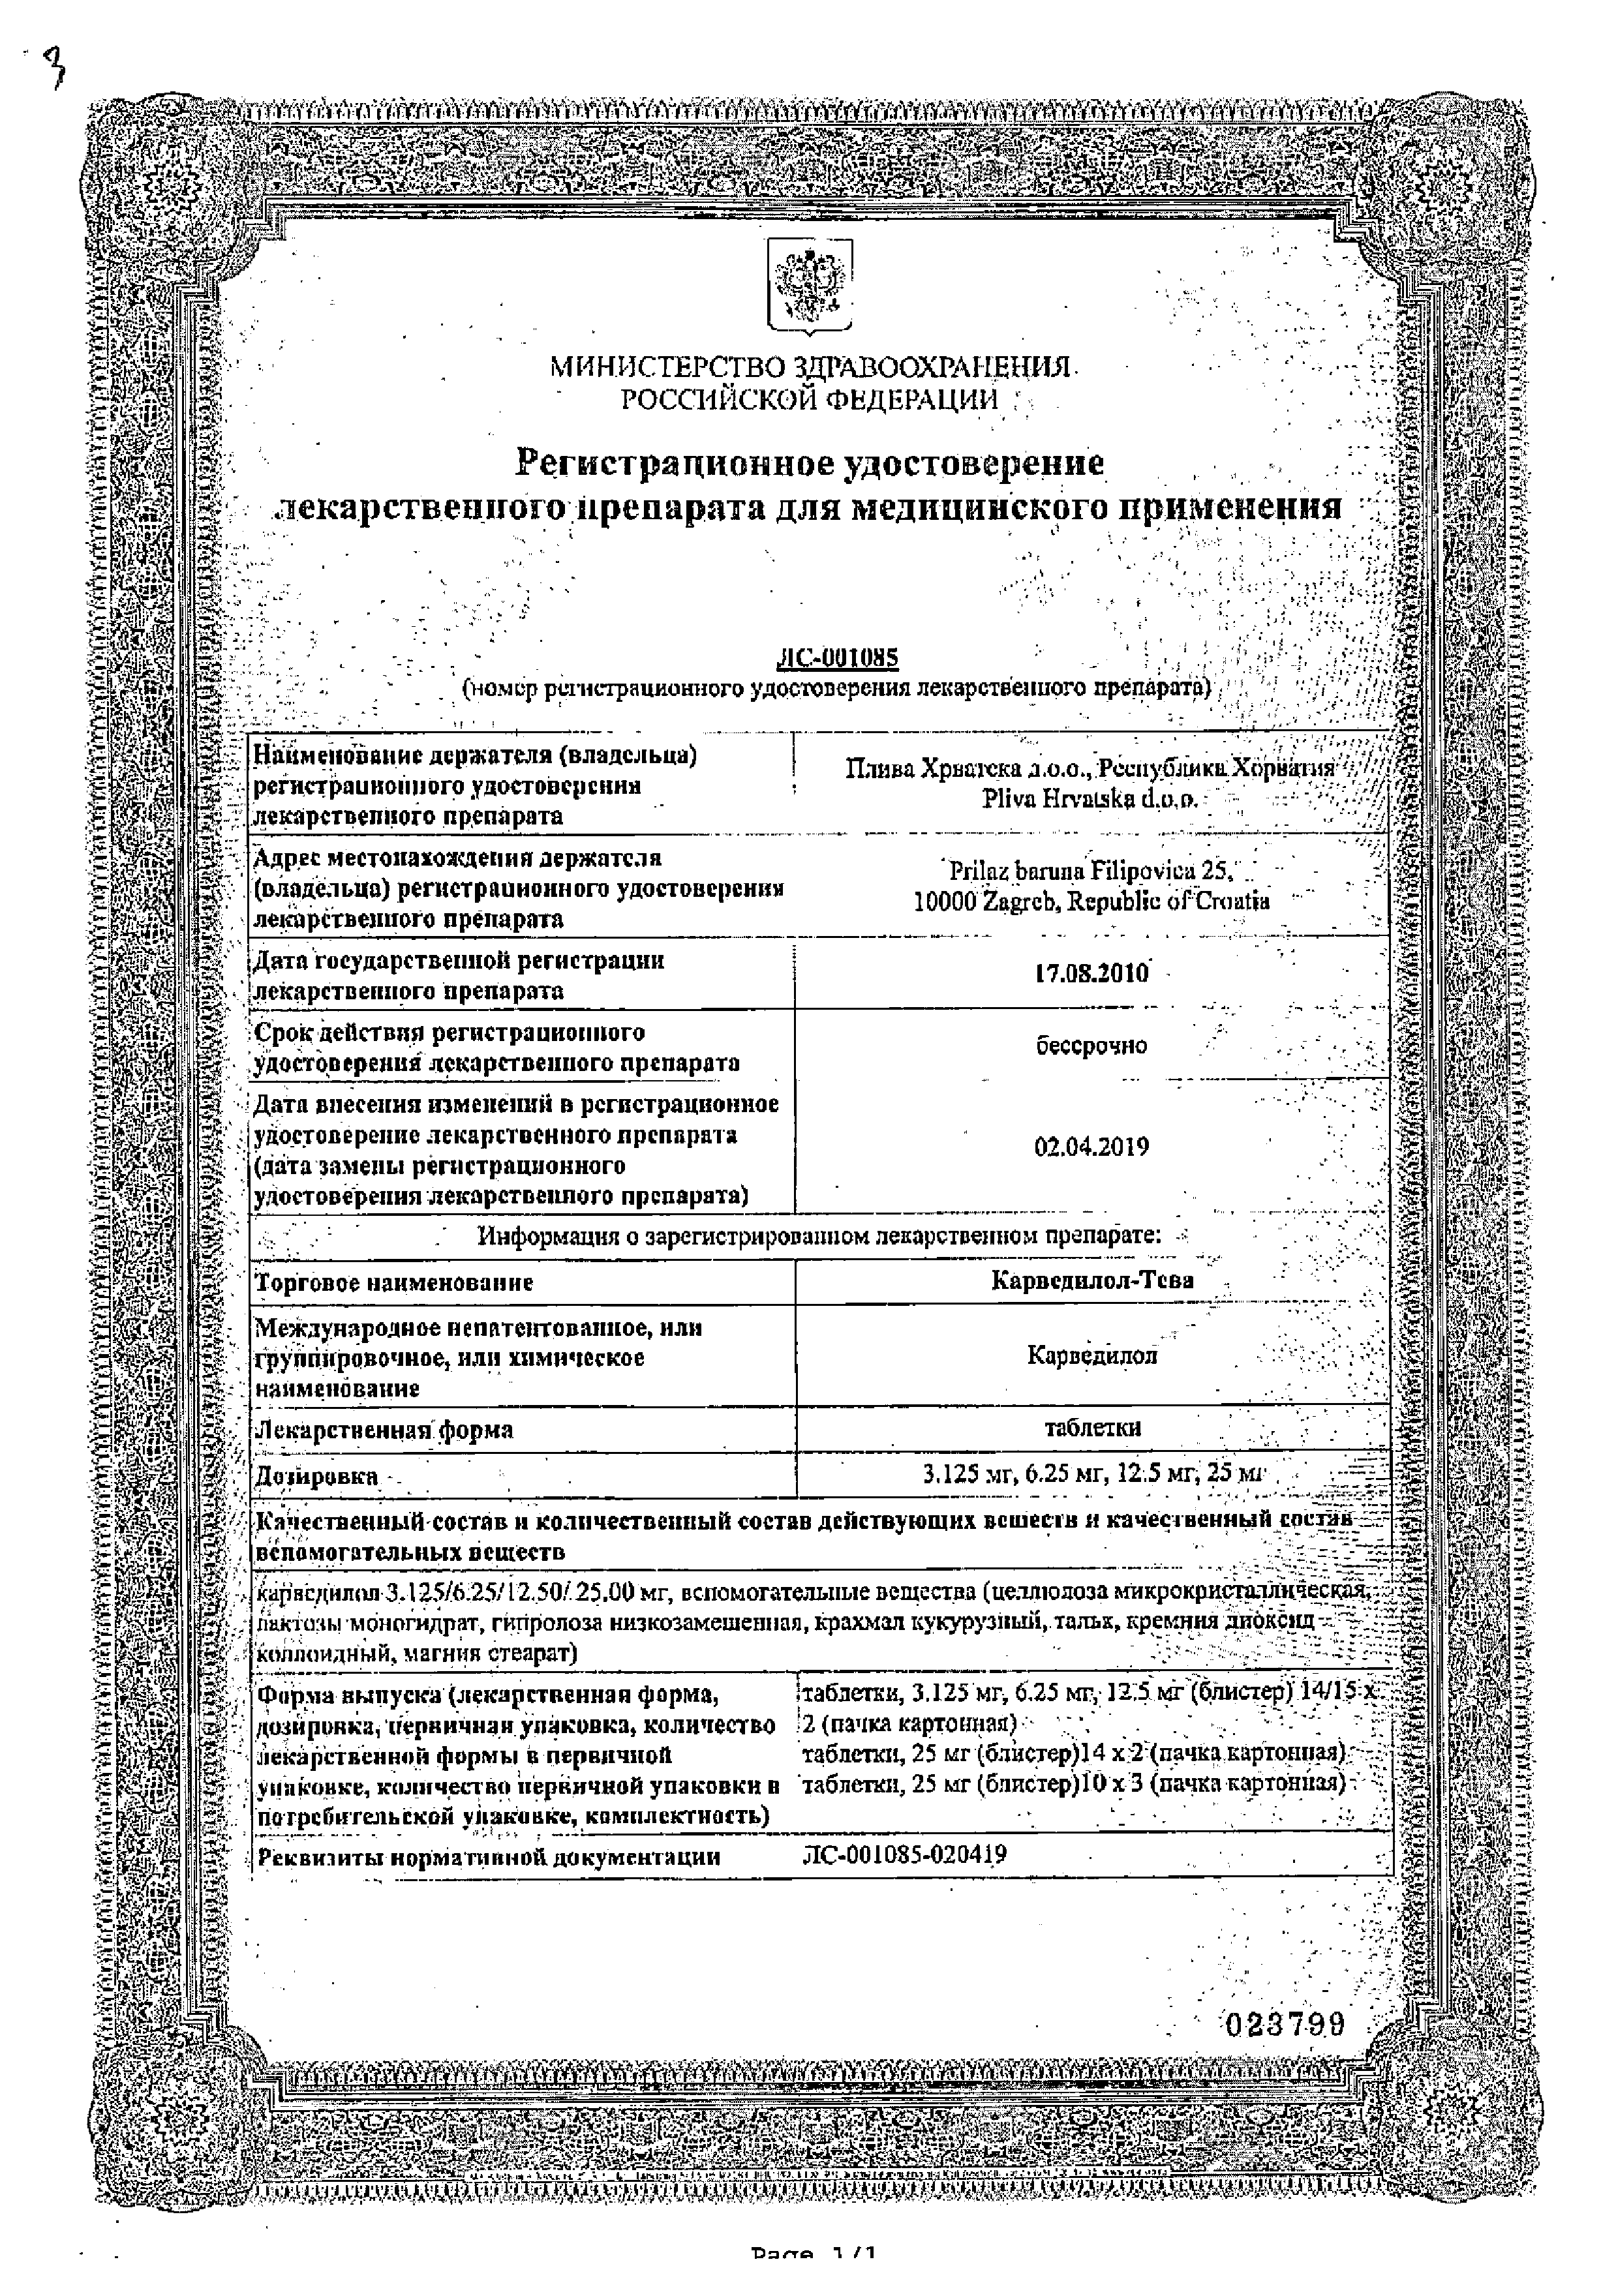 Карведилол Тева сертификат